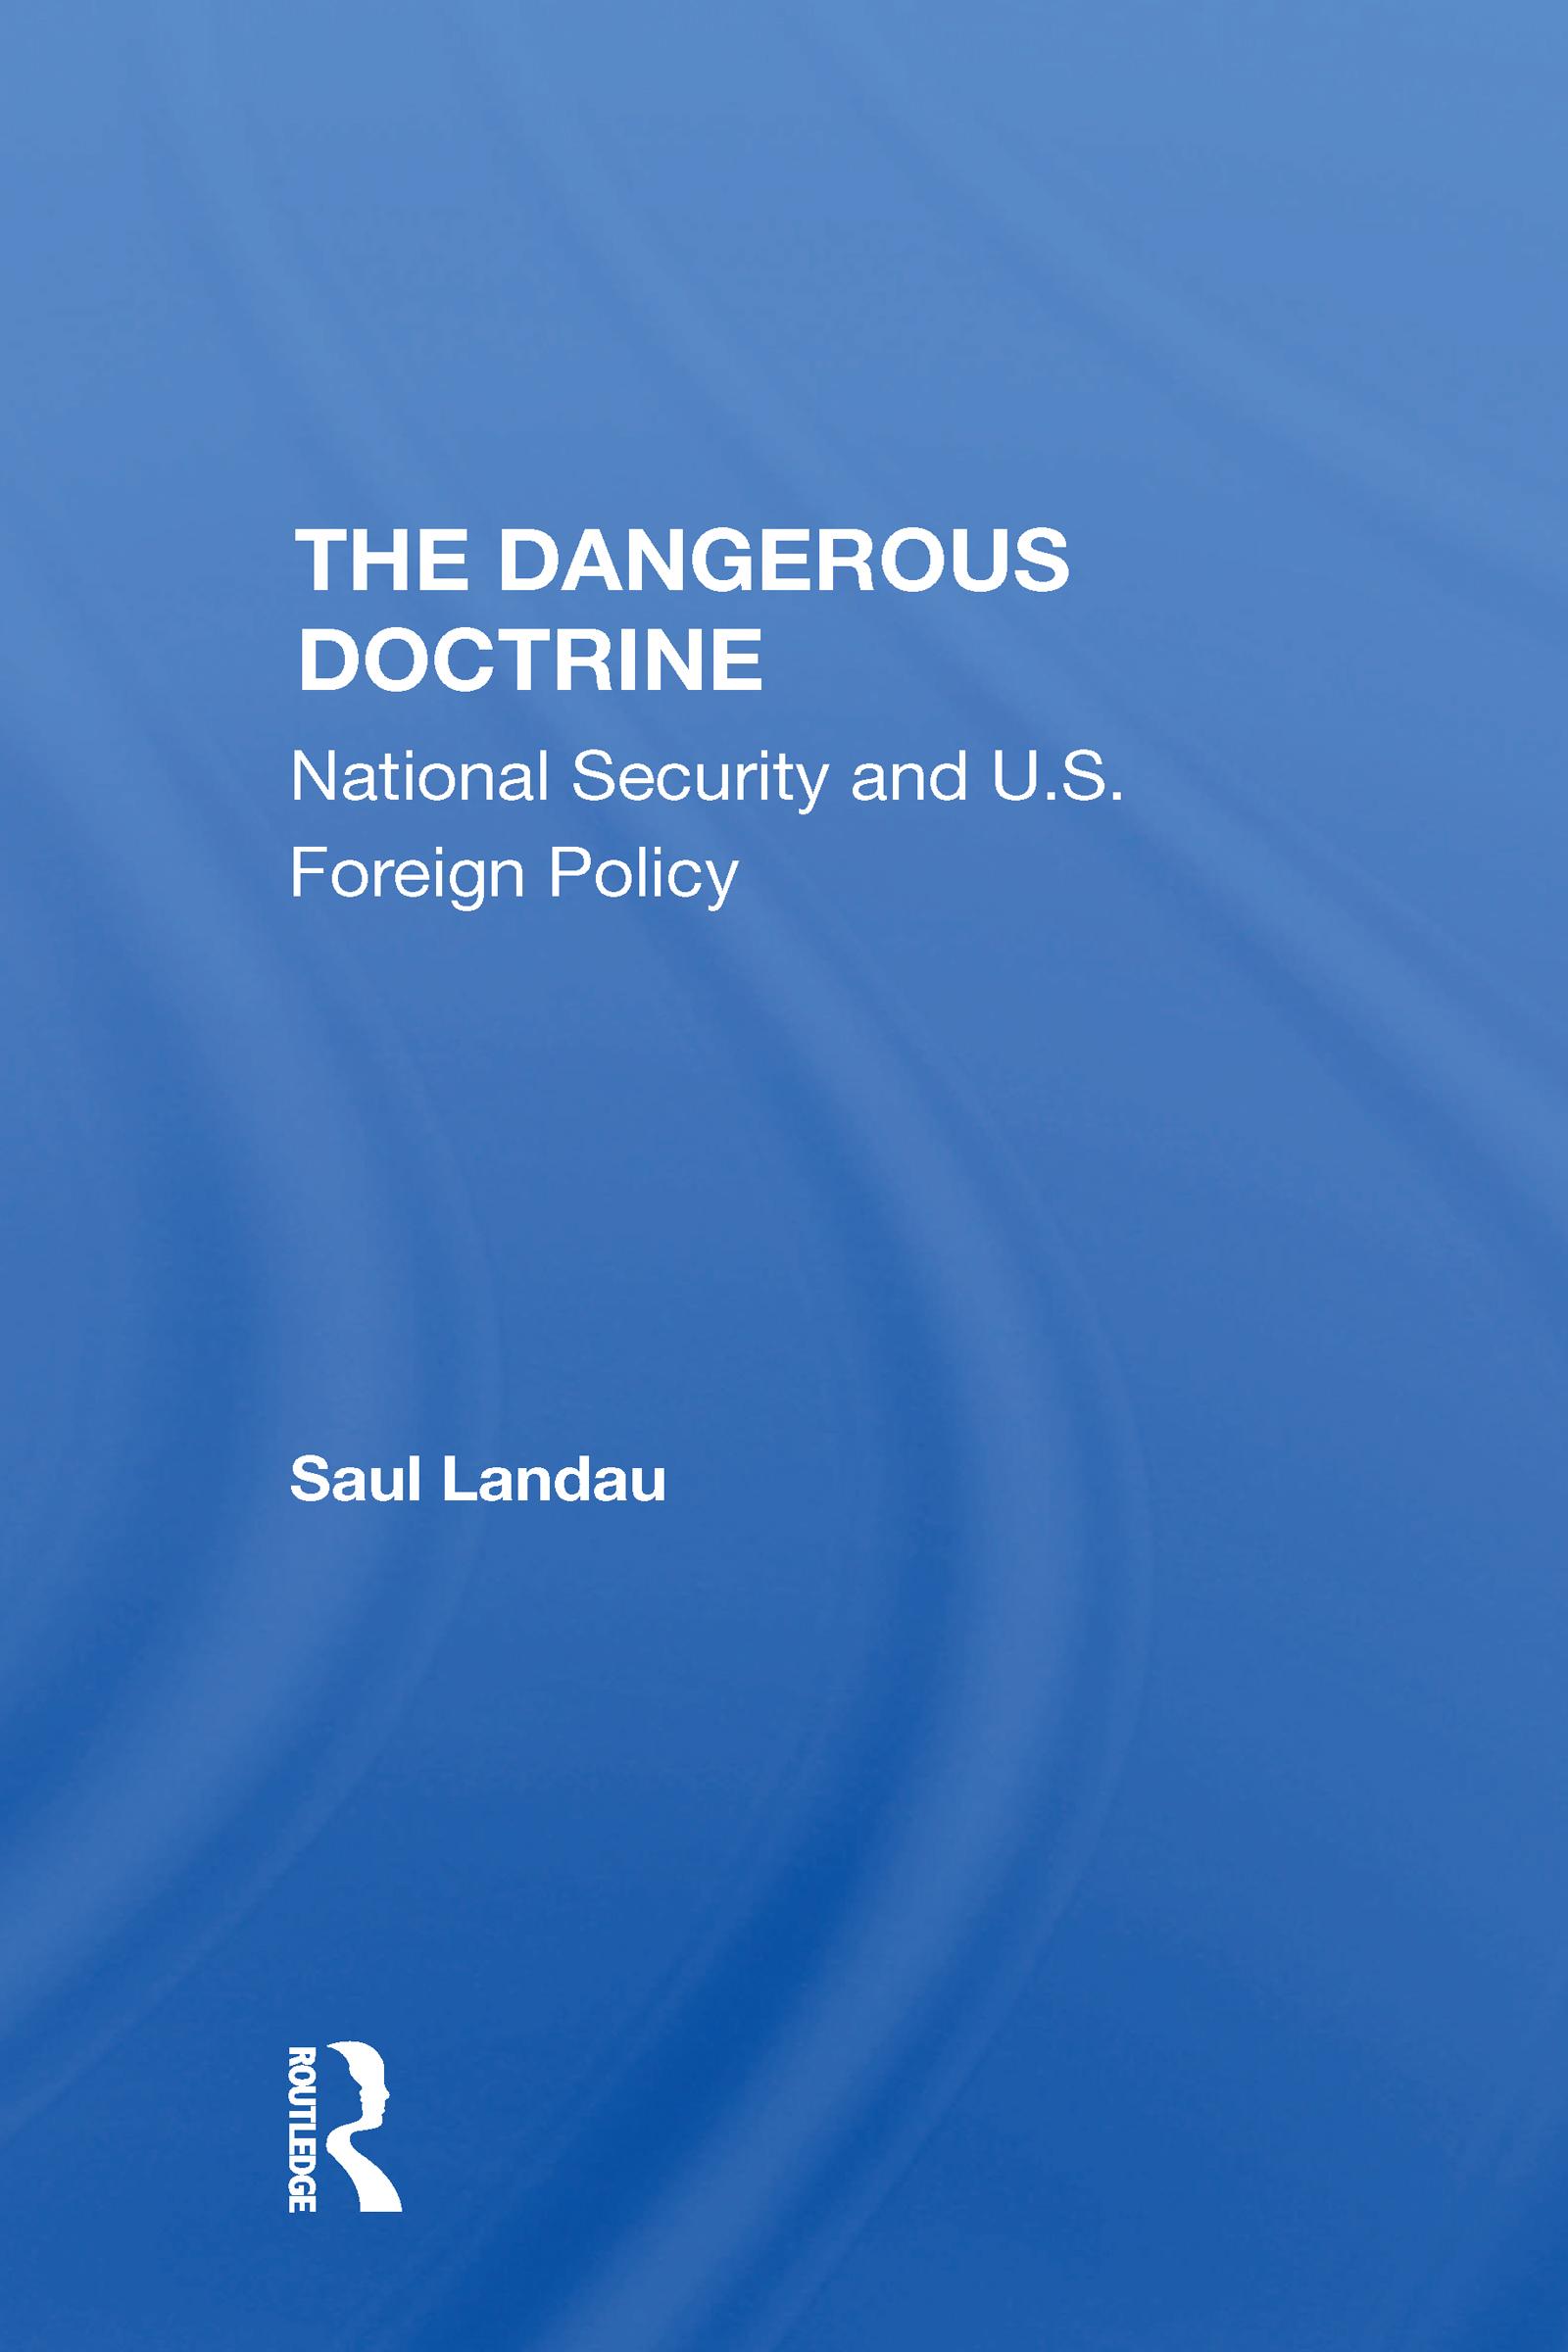 The Dangerous Doctrine